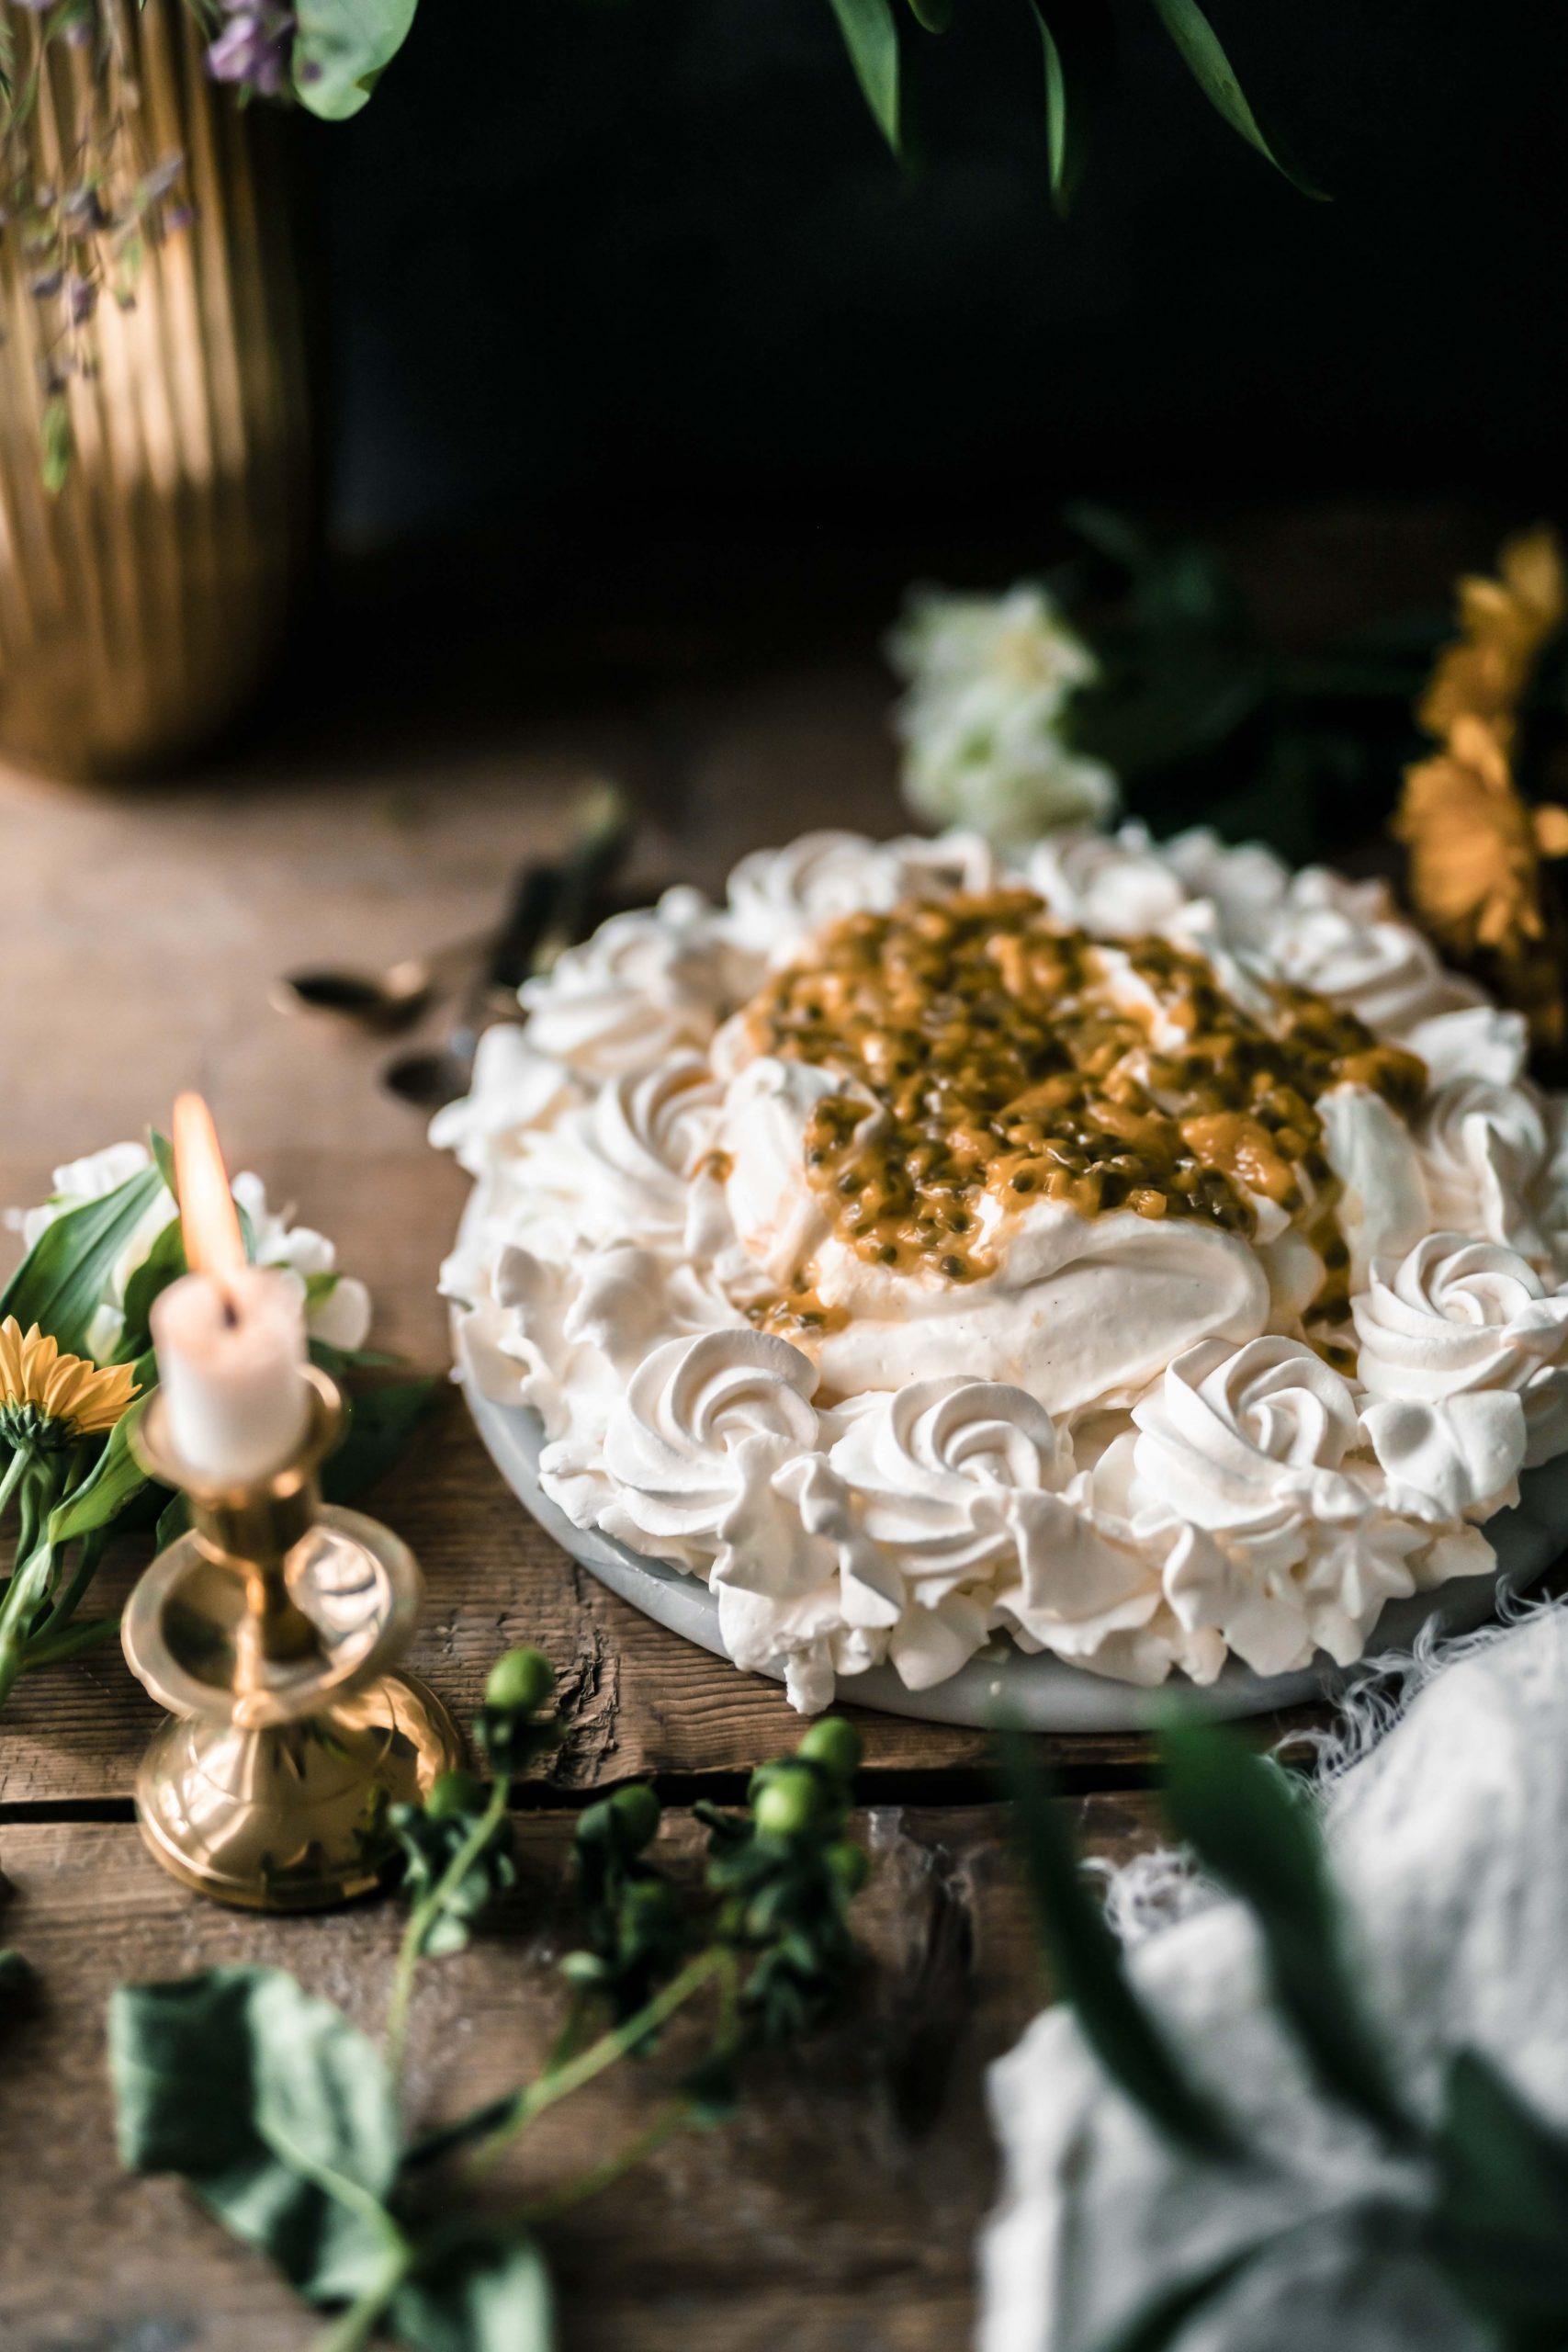 four ingredient passion fruit pavlova recipe by Emma Ivane